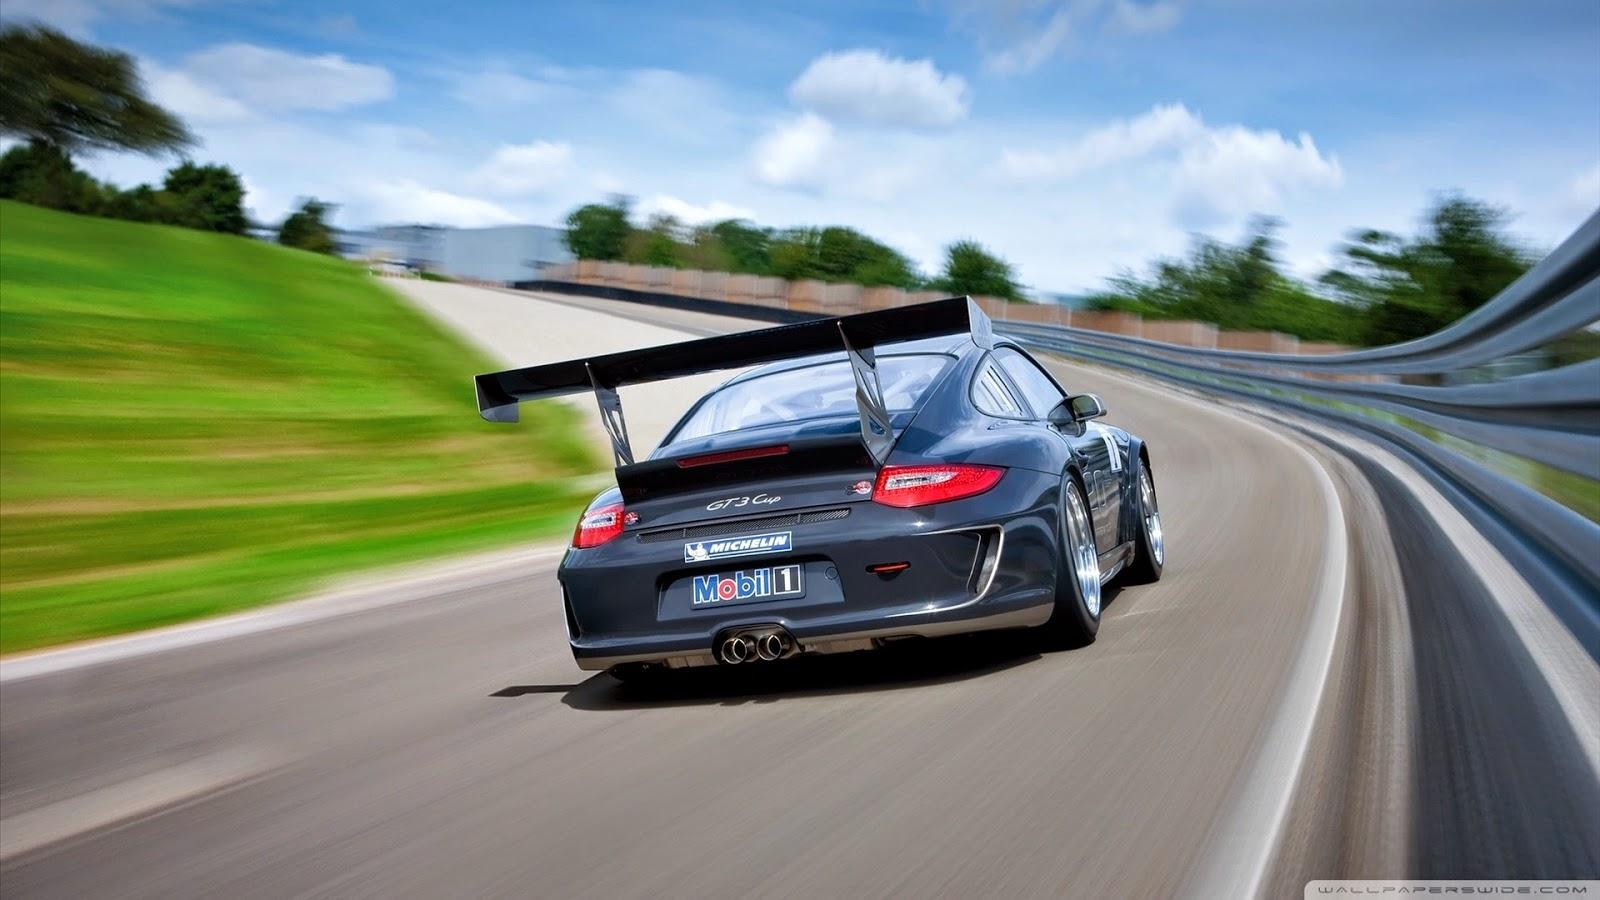 Porsche Wallpapers, Car Wallpapers, Porsche Car, Porsche Car Wallpapers, Car  Desktop Wallpapers